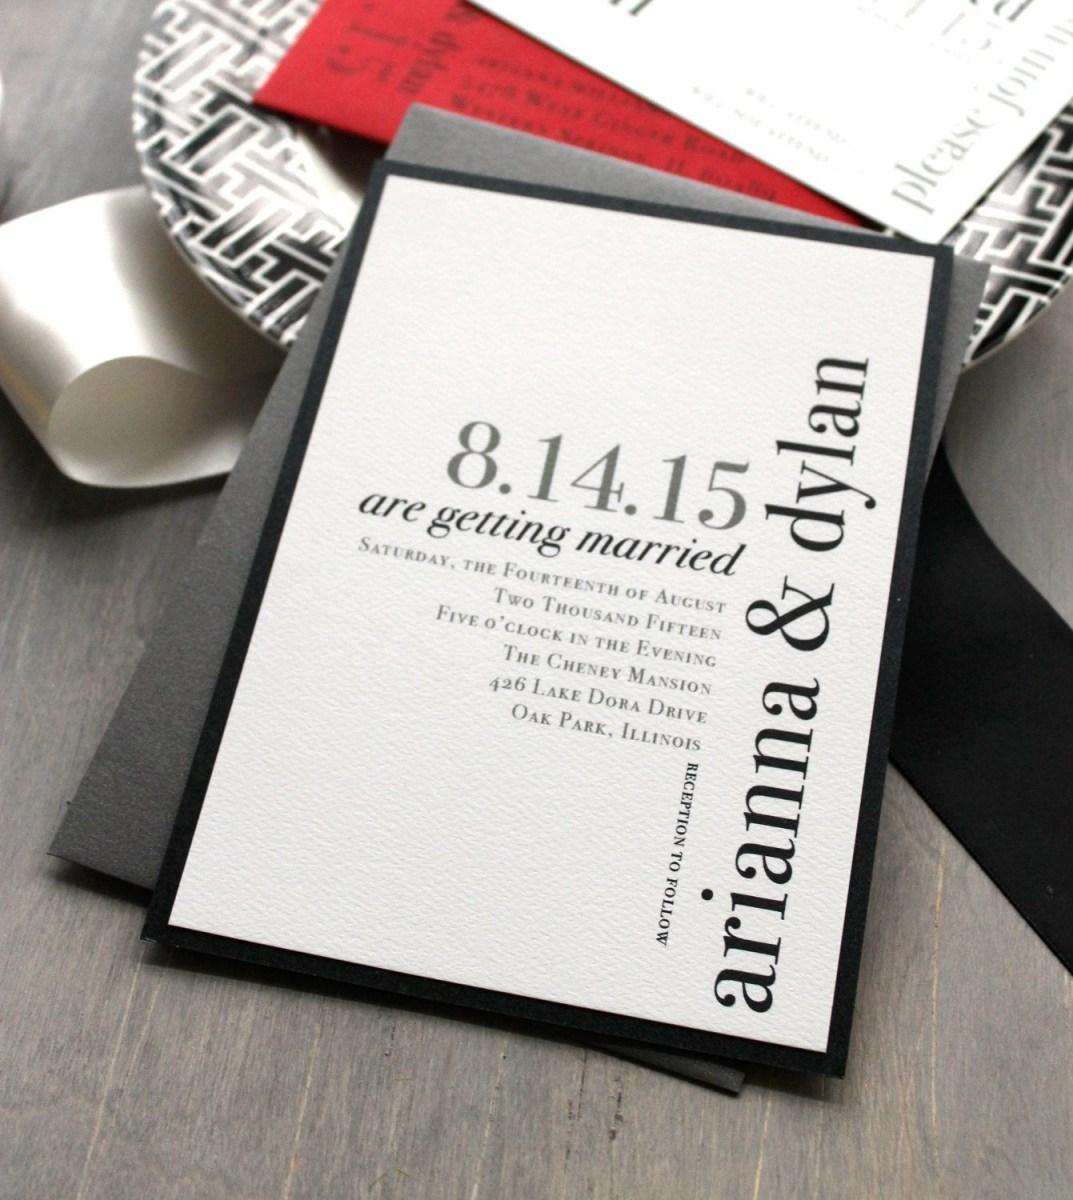 Unique Wedding Invitation Ideas Unique Wedding Invitation Ideas Invatations Announcements And